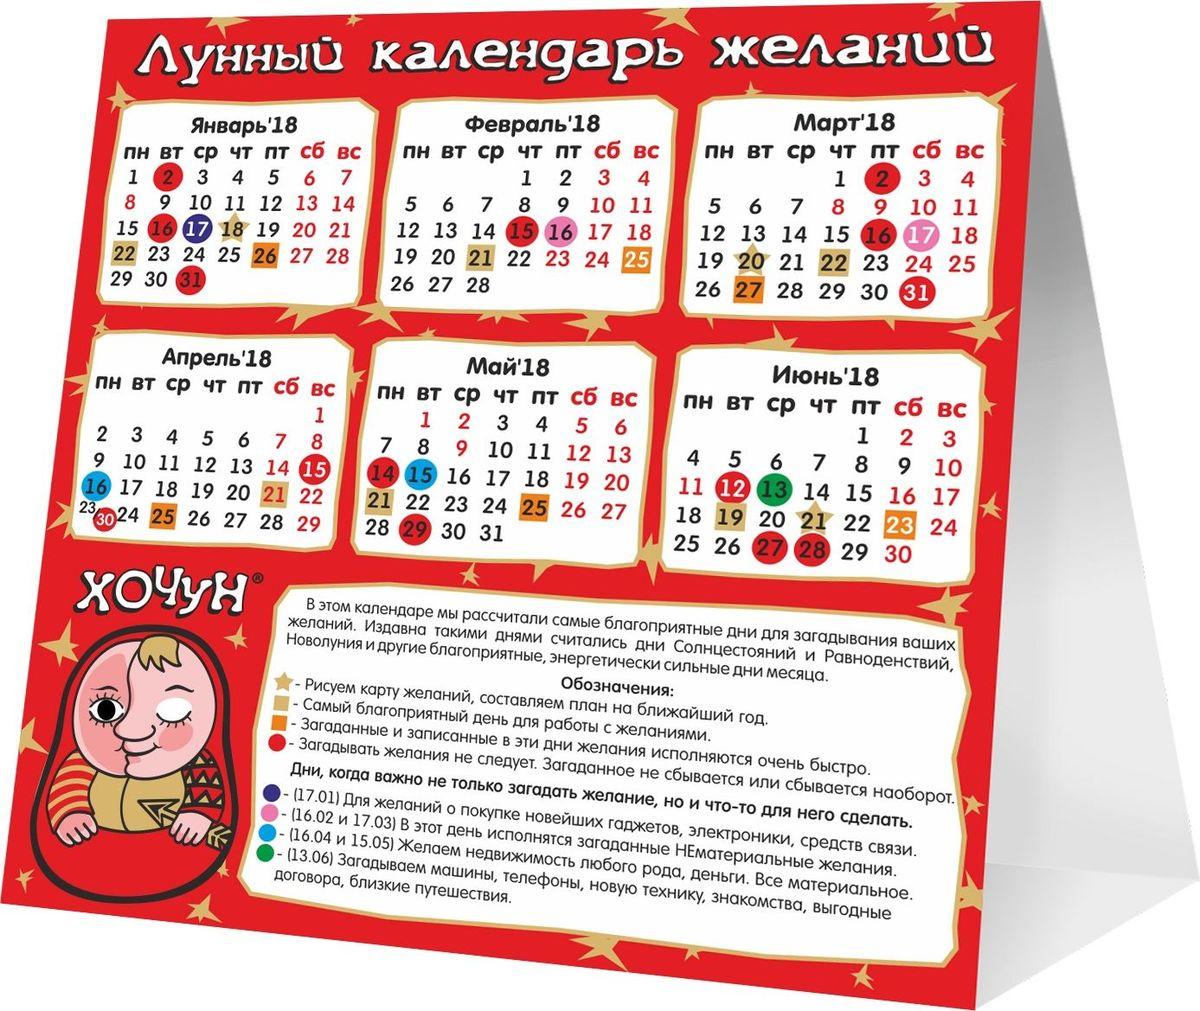 Лунный календарь 2018 Хочун, 14, 5 х 15 см канцелярия